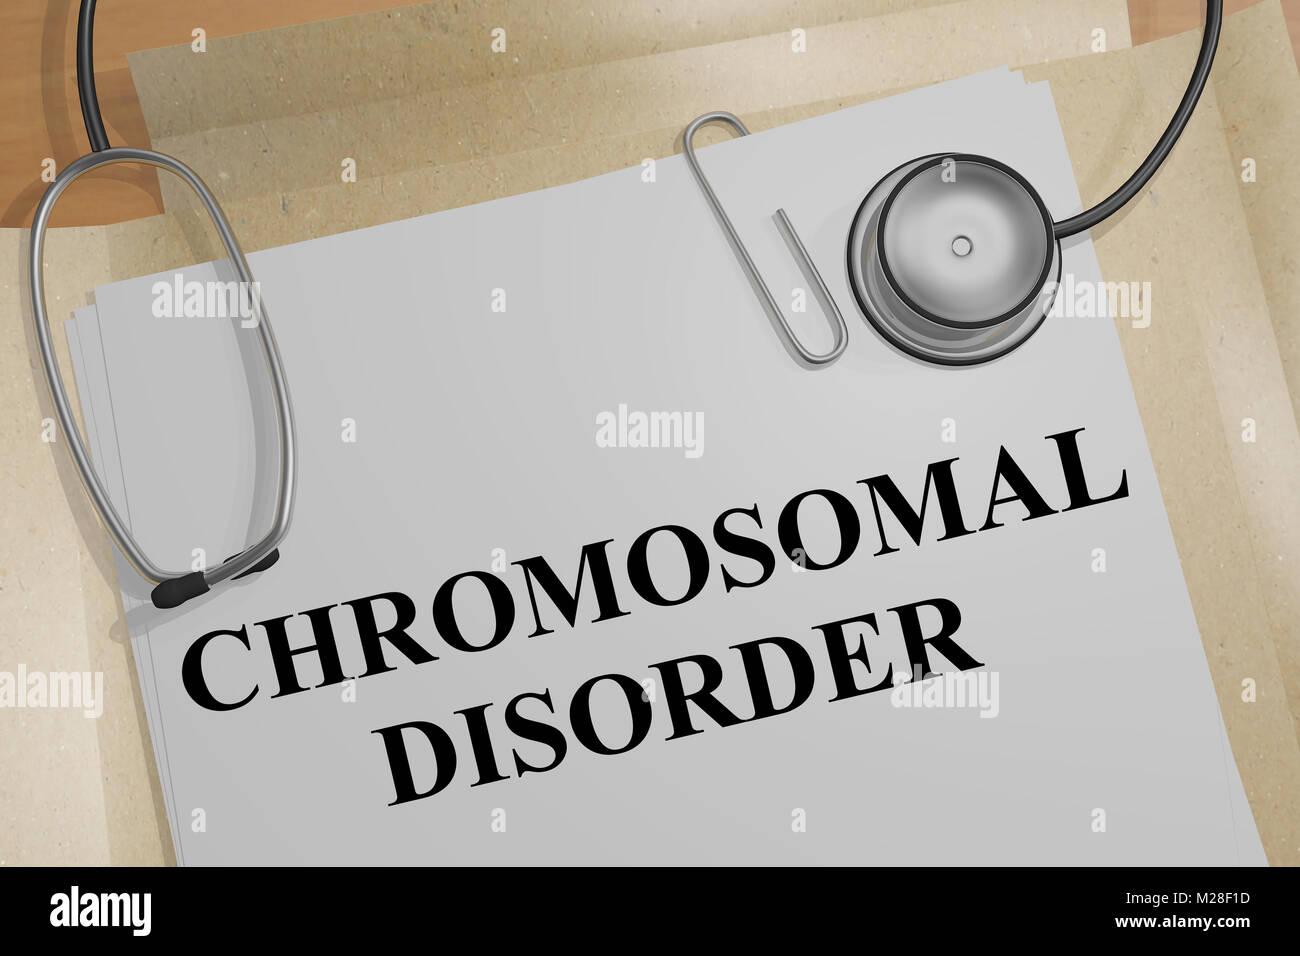 3D illustration of CHROMOSOMAL DISORDER title on a medical document - Stock Image